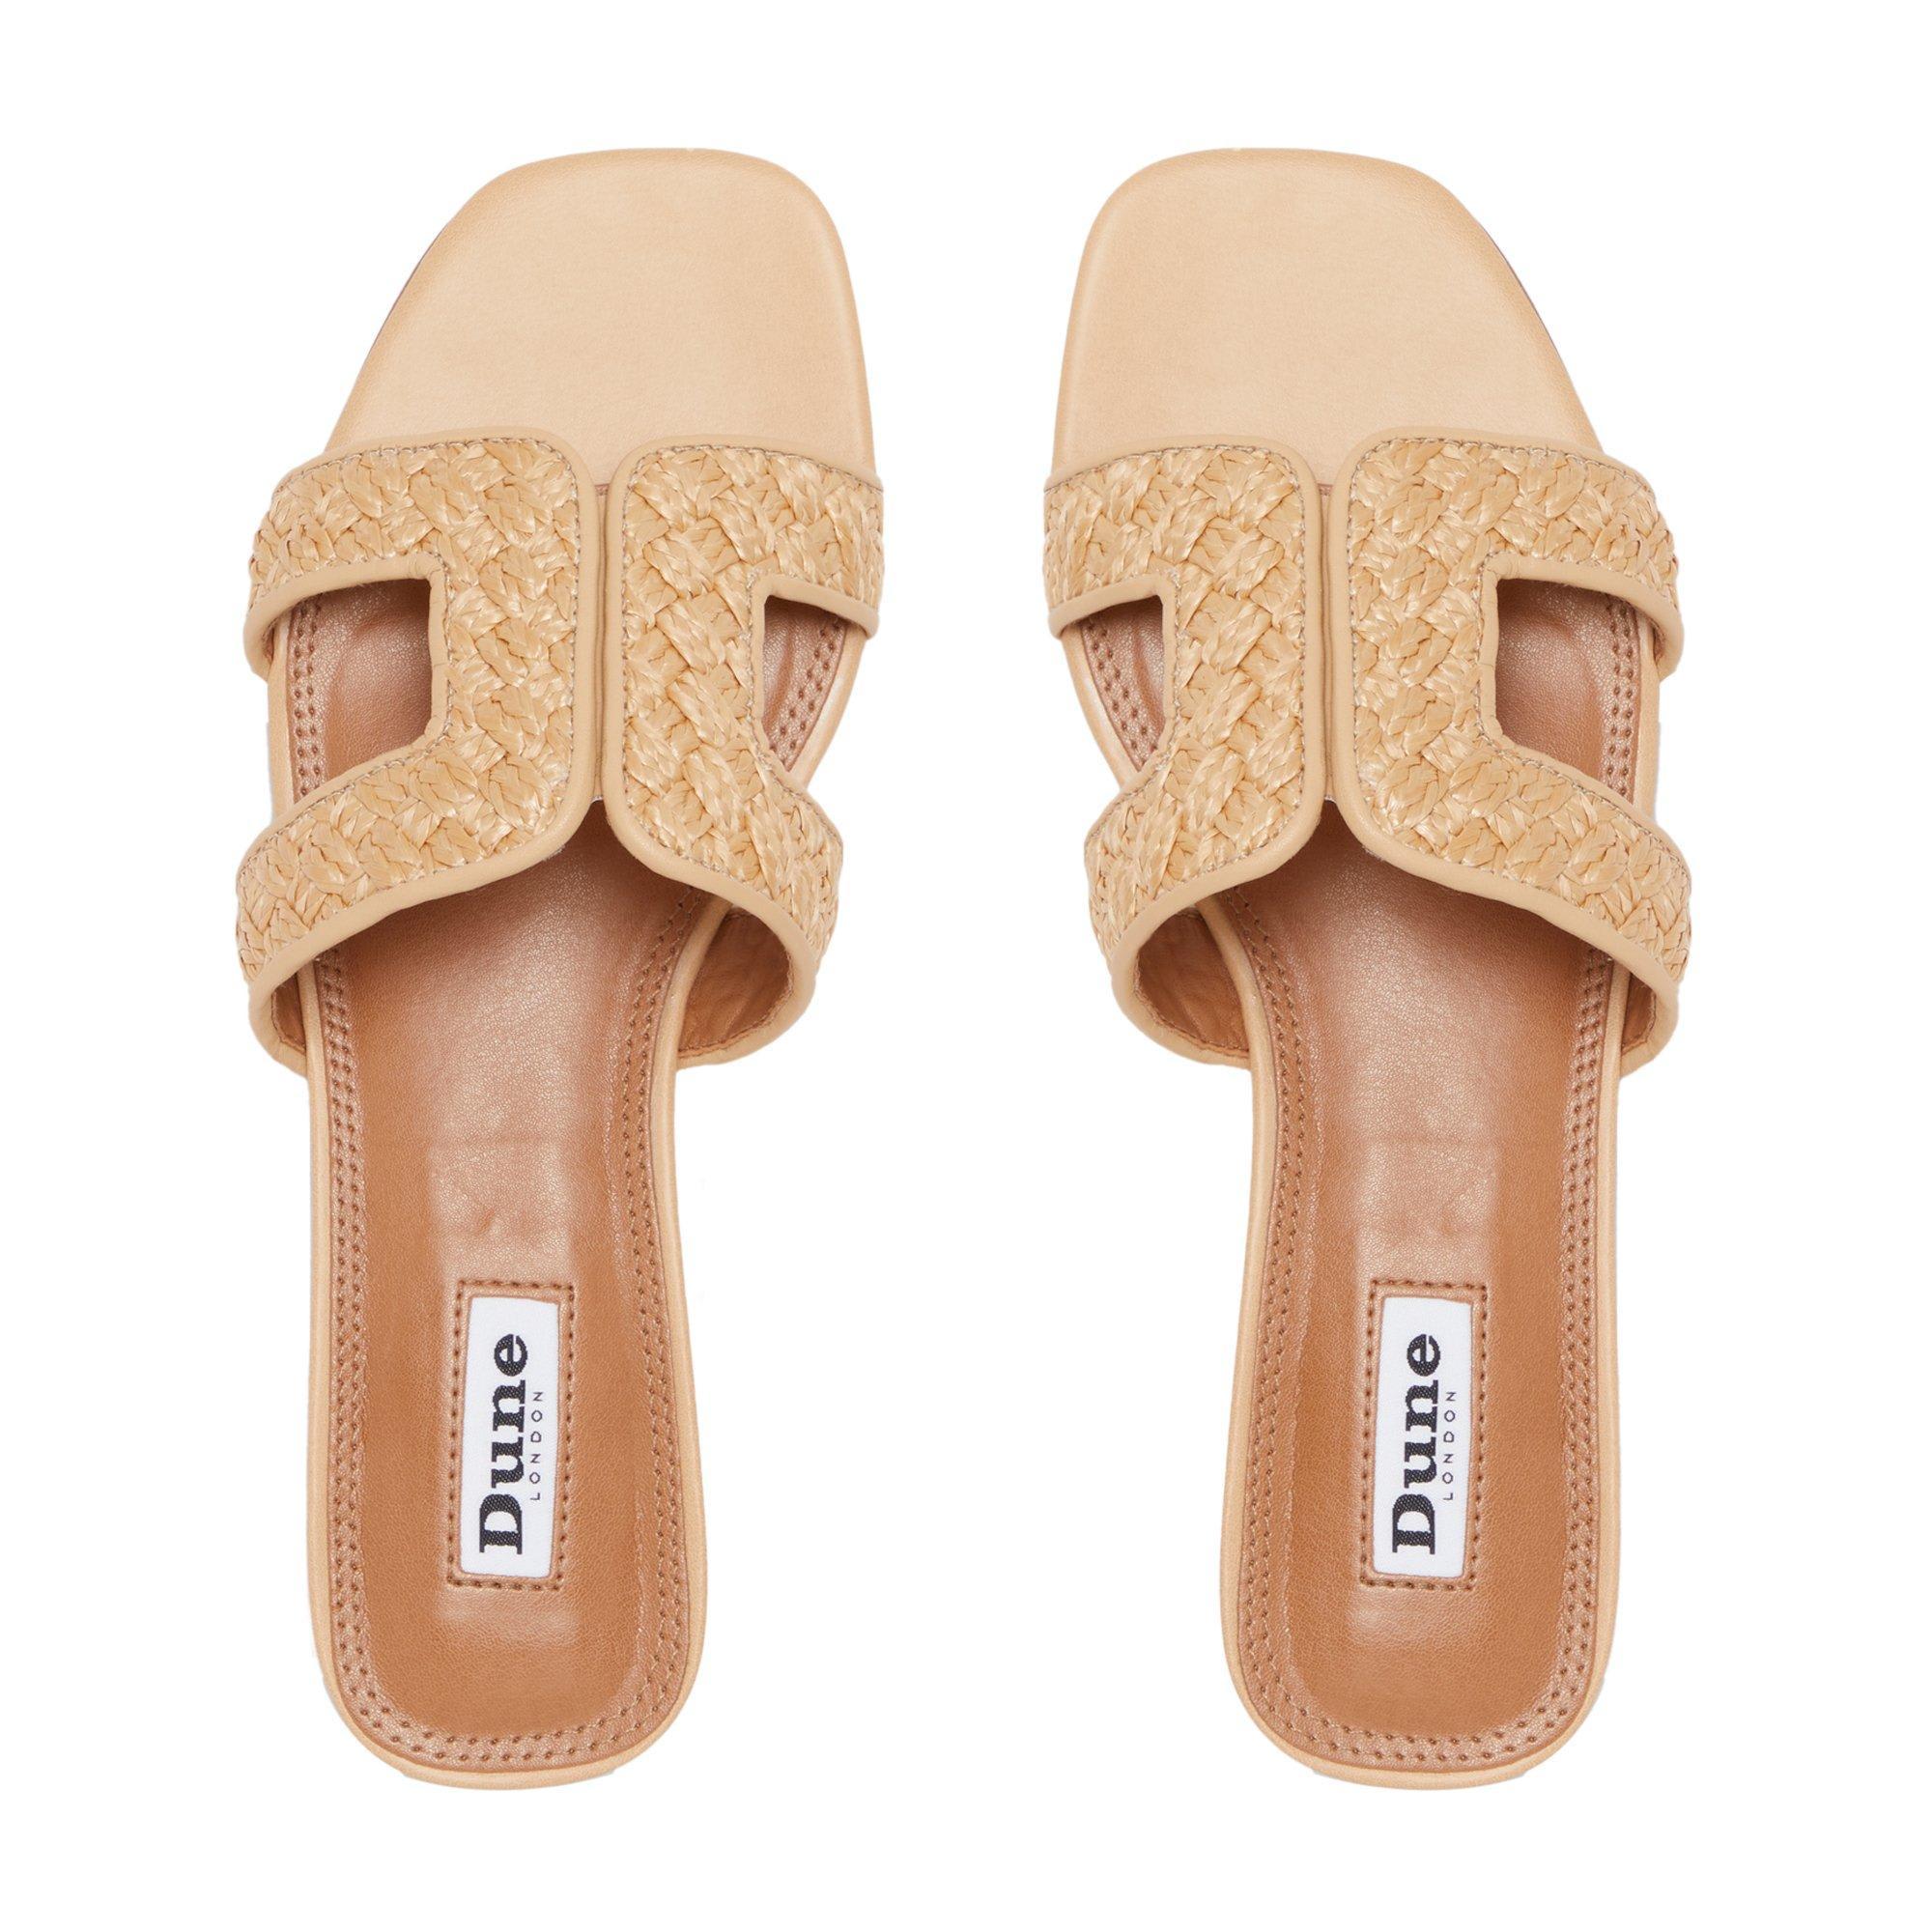 thumbnail 9 - Dune Ladies LOUPE Smart Slider Sandals